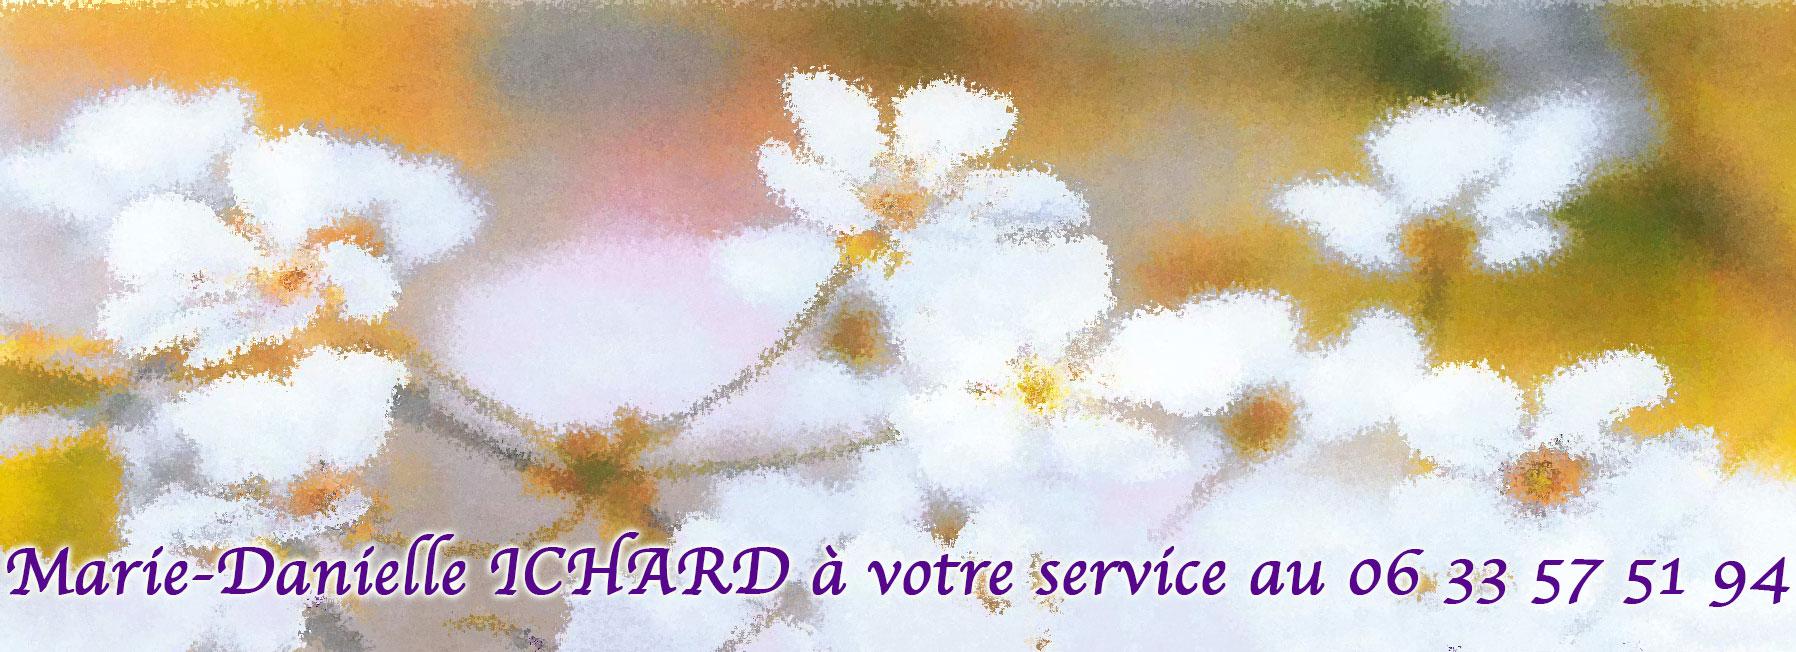 MD-service.jpg